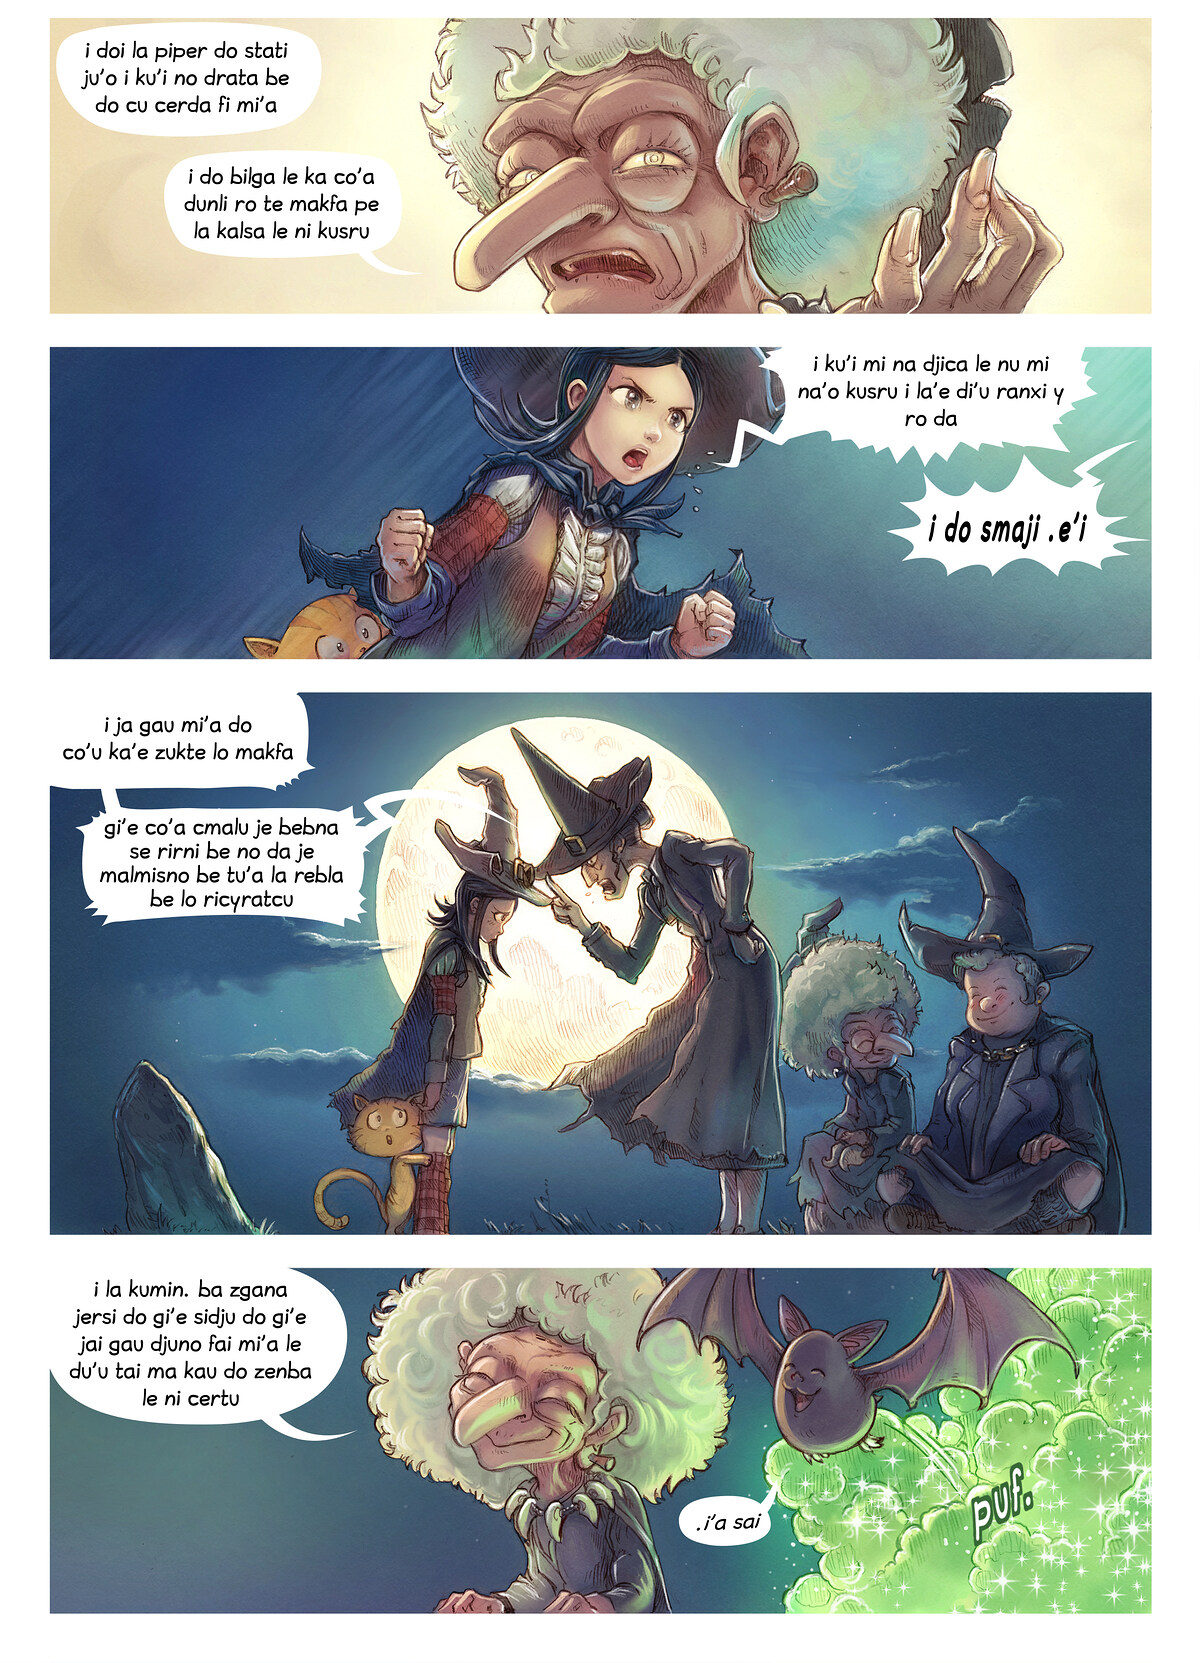 i 11 mo'o lisri le te makfa pe la kalsa, Page 2